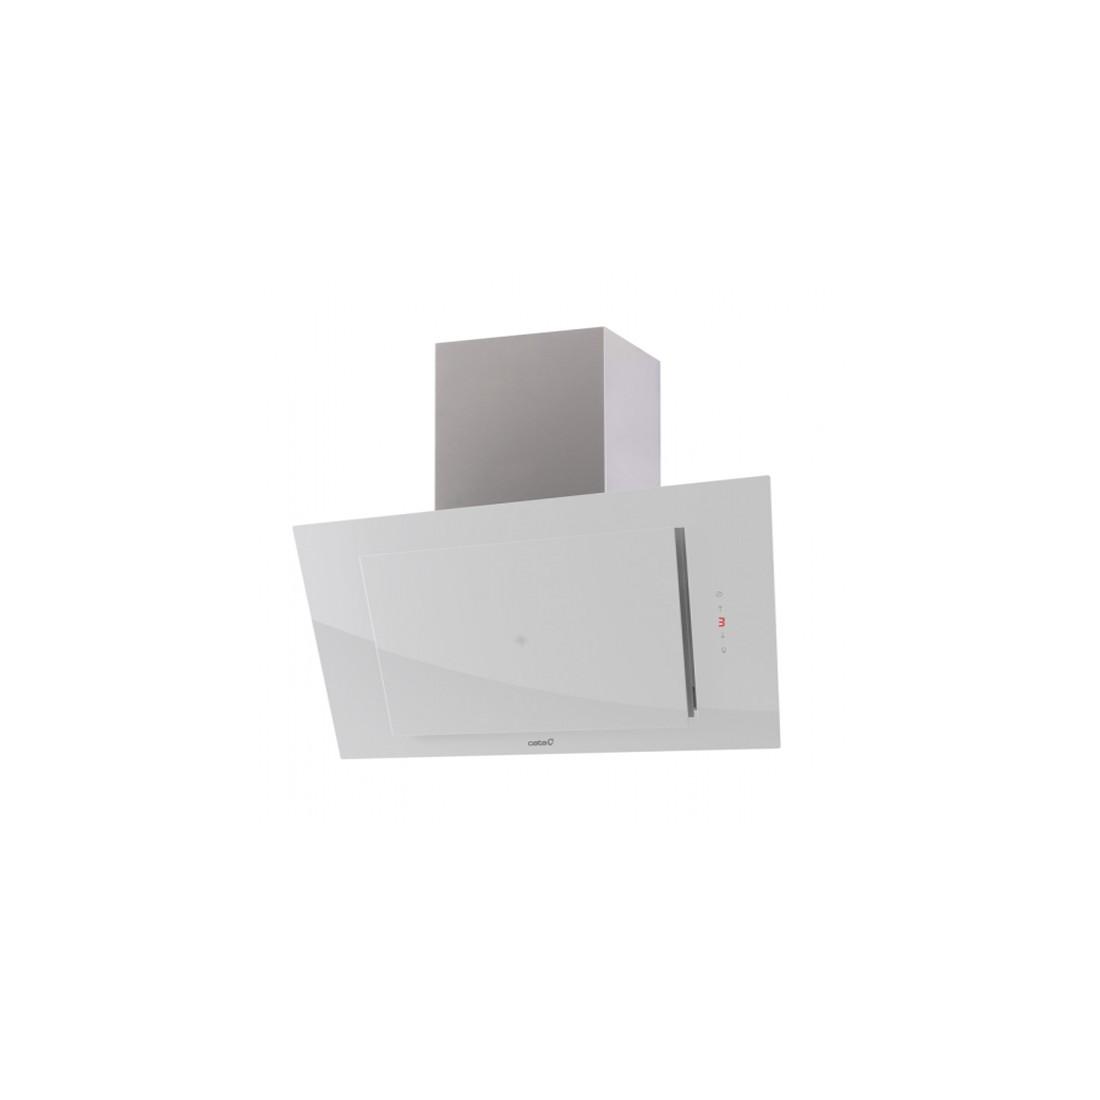 Campana Decorativa - Cata THALASSA 700XGWH Blanco, 70 cm